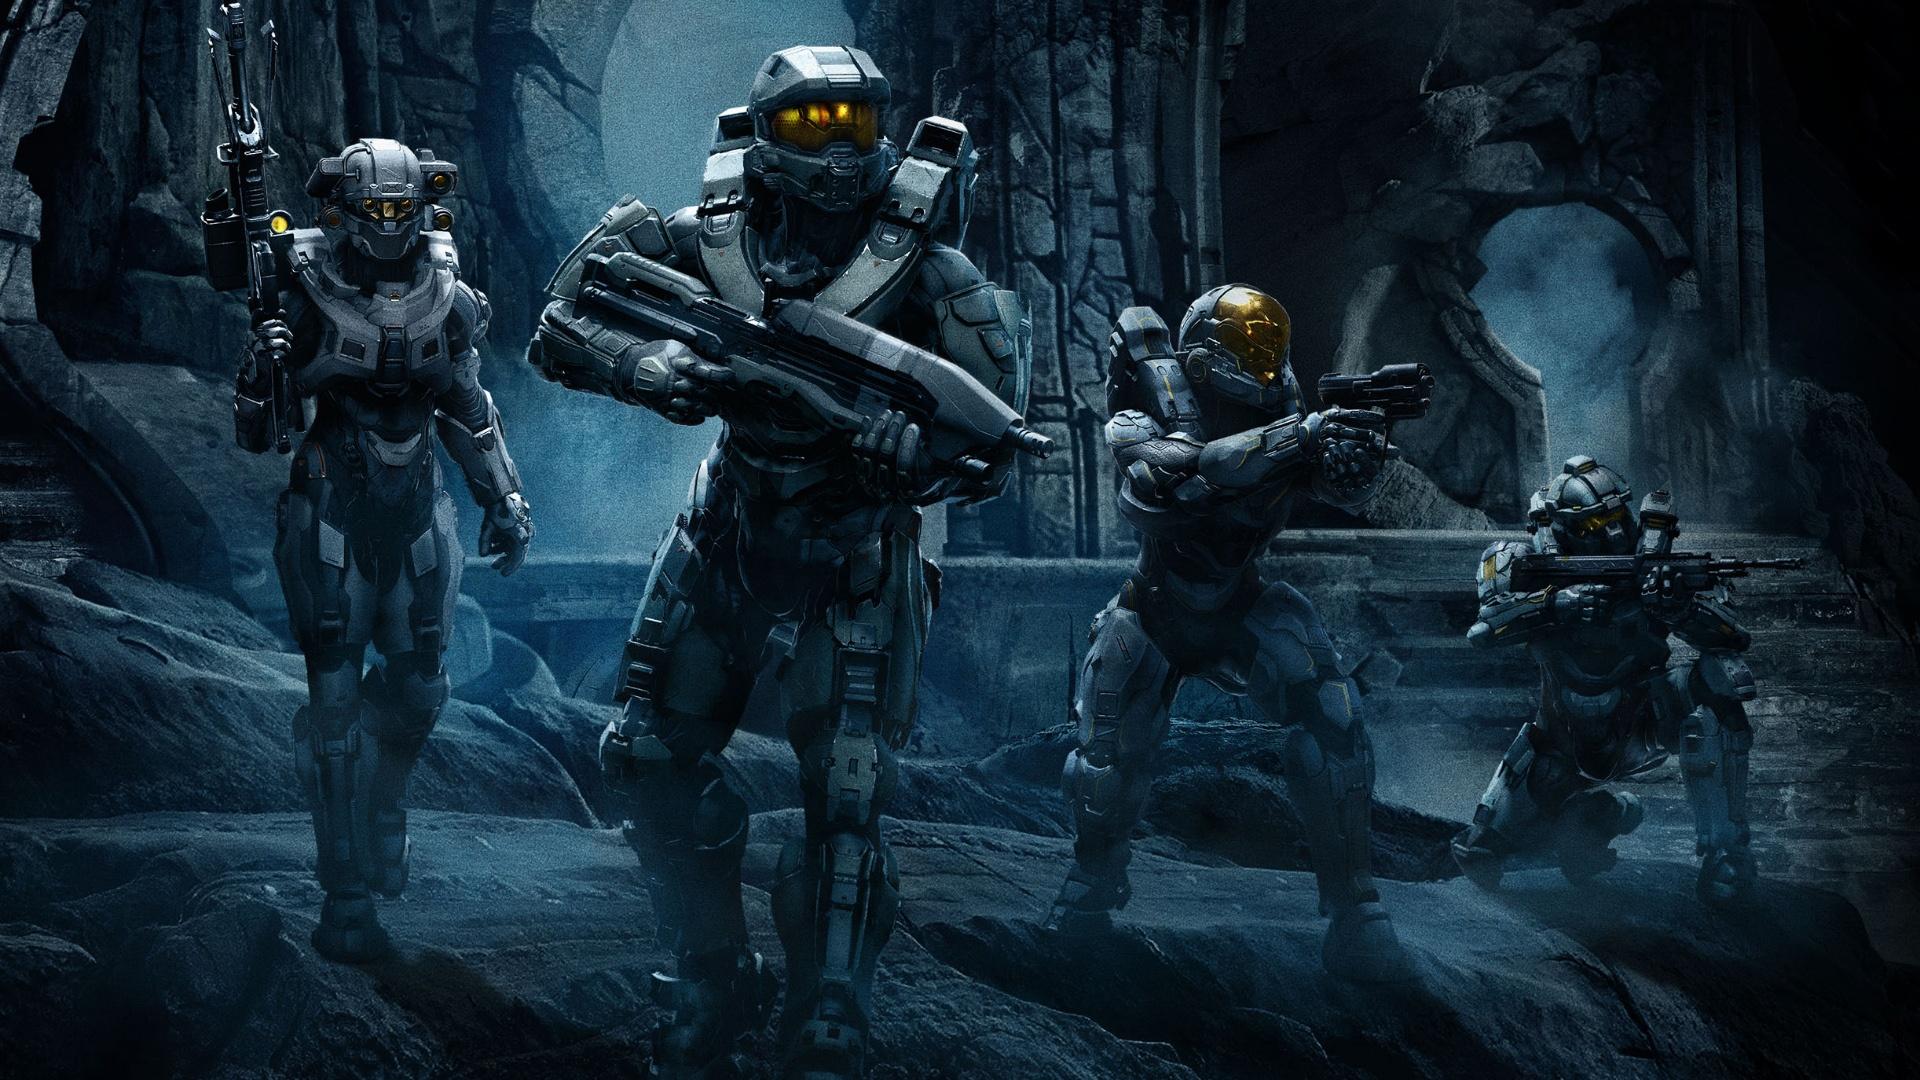 Halo-Guardians-Team-Chief-HD-1920%C3%971080-wallpaper-wp3806231